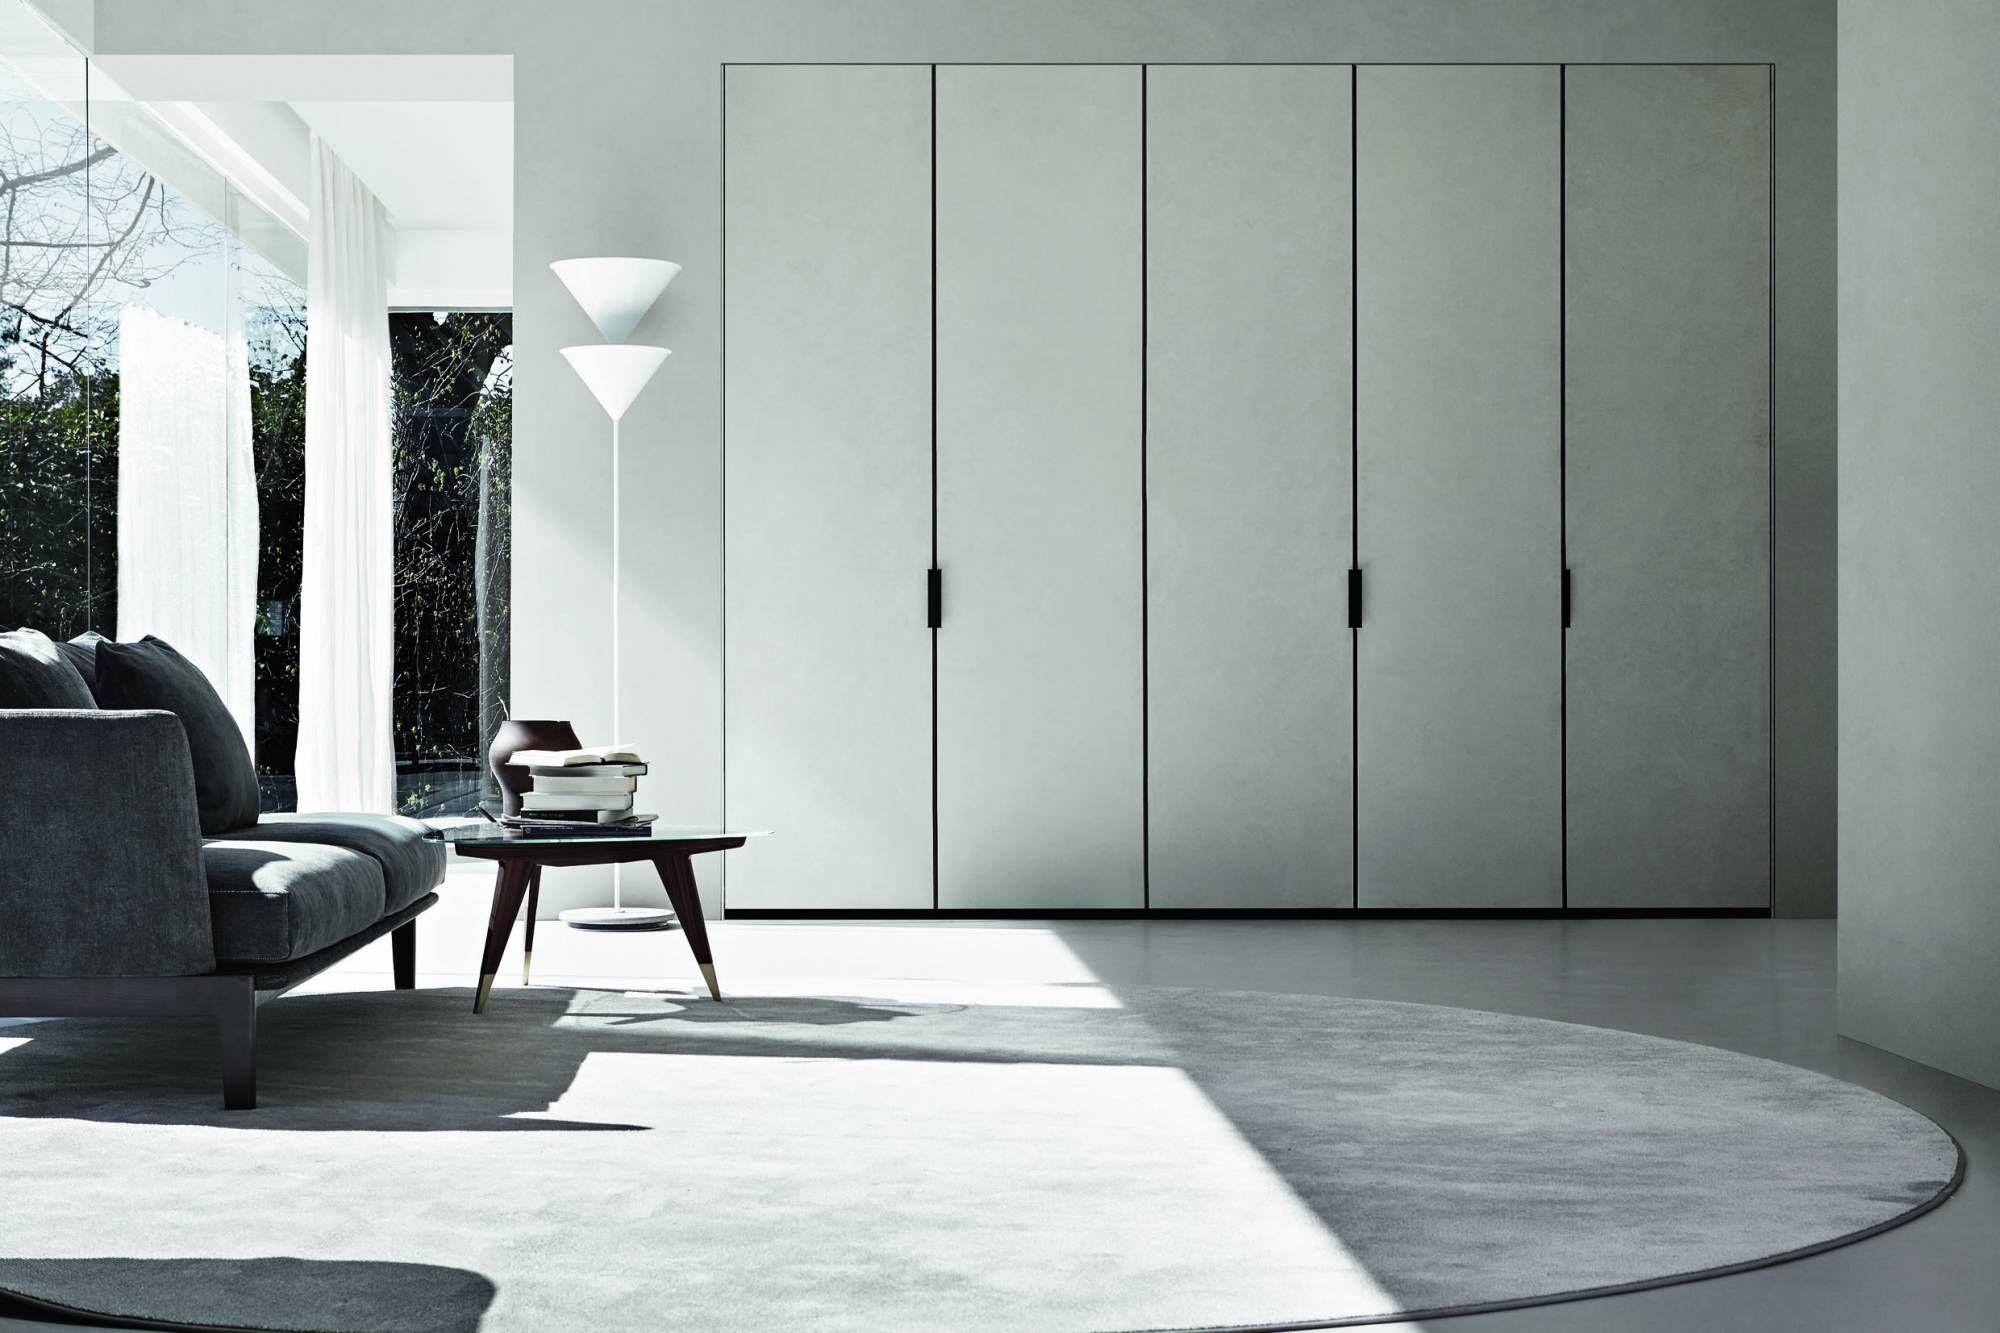 Projects Vincent Van Duysen home Pinterest Interiors